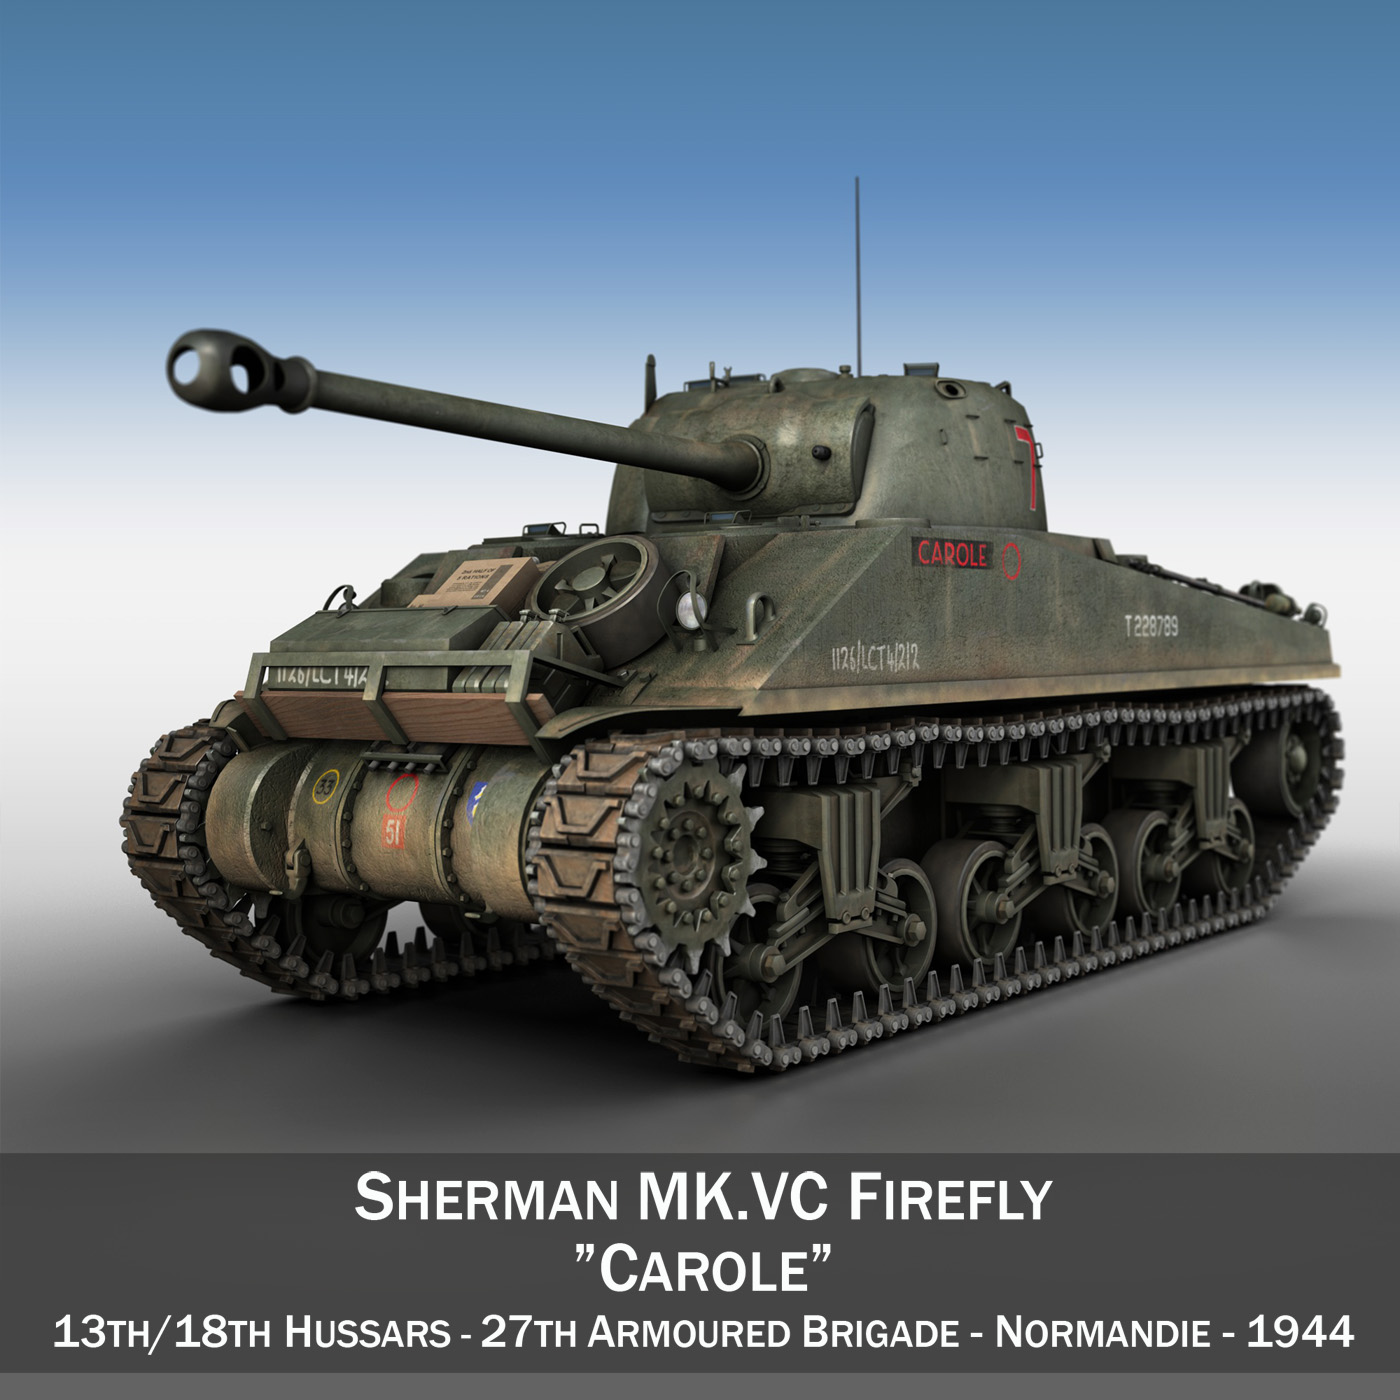 Sherman MK VC Firefly - Carole 3d model 3ds fbx c4d lwo lws lw obj 267426